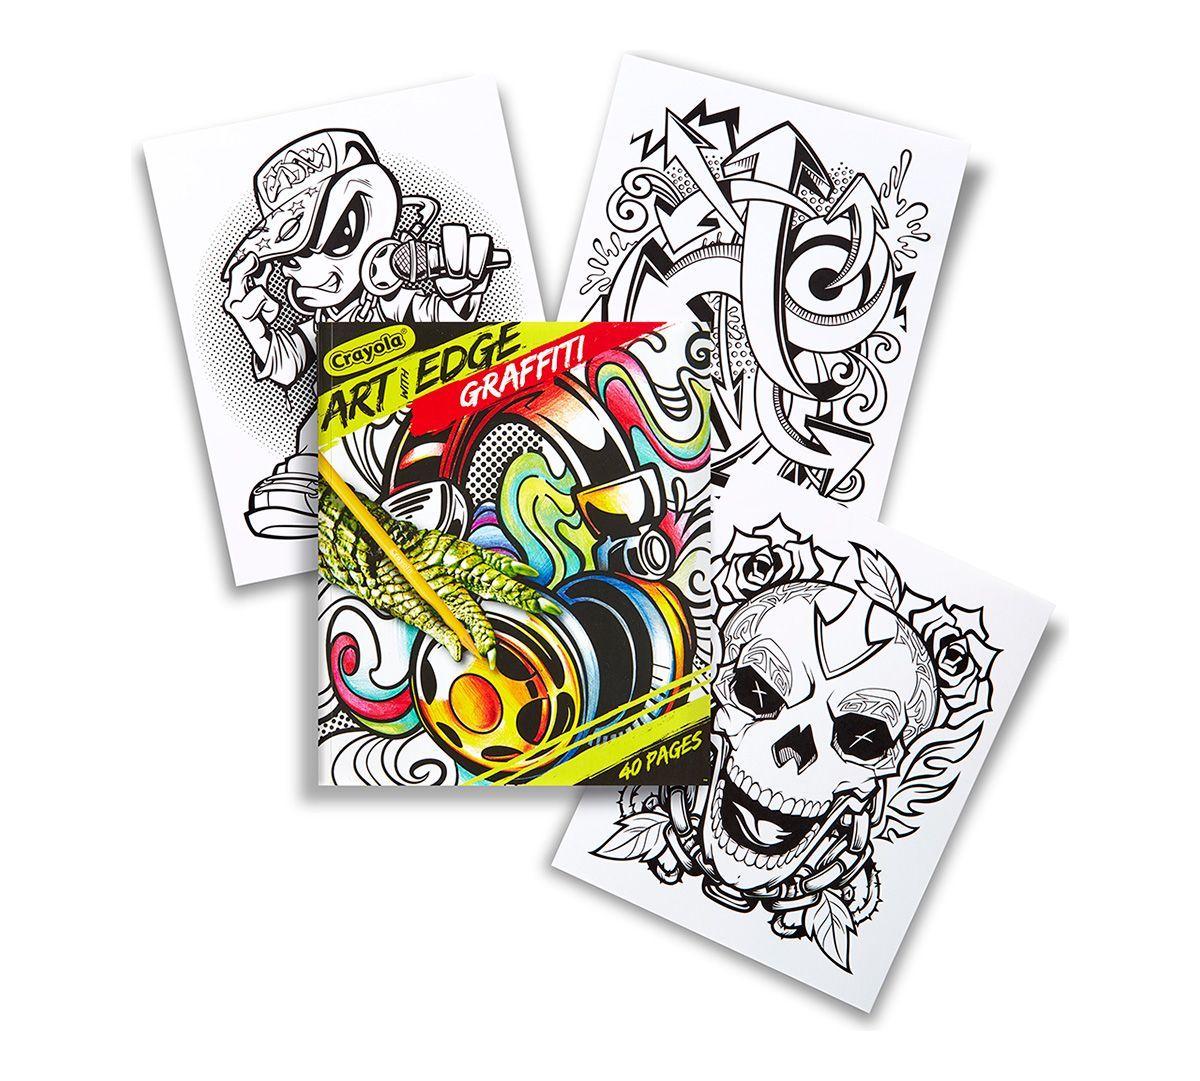 Art With Edge Graffiti Crayola Coloring Book Art Crayola Art Coloring Books